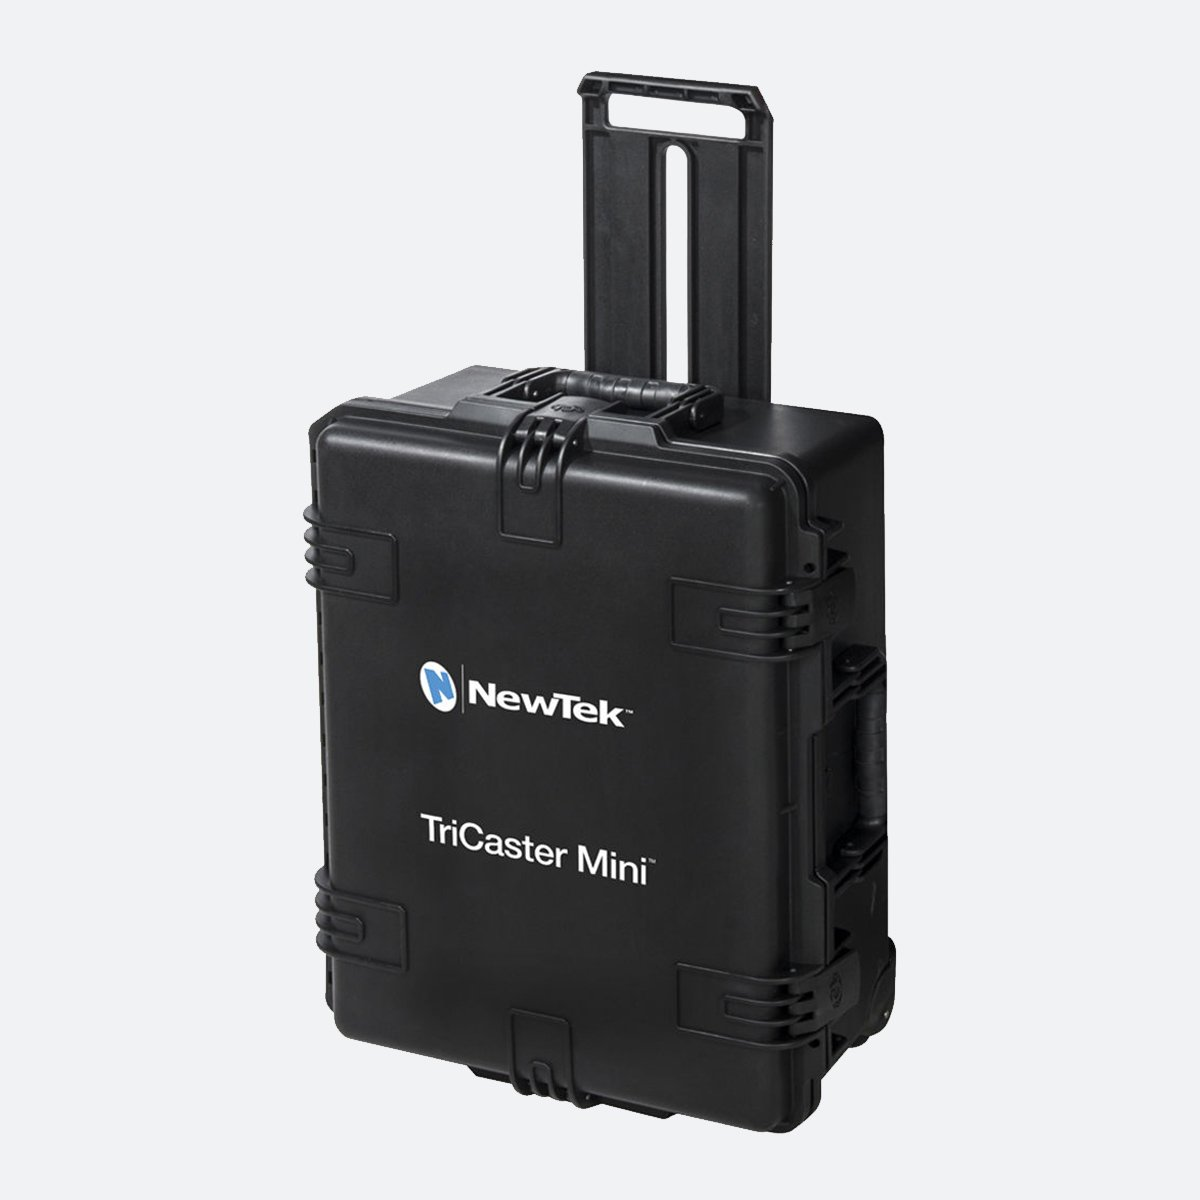 NewTek TriCaster Mini Travel Case